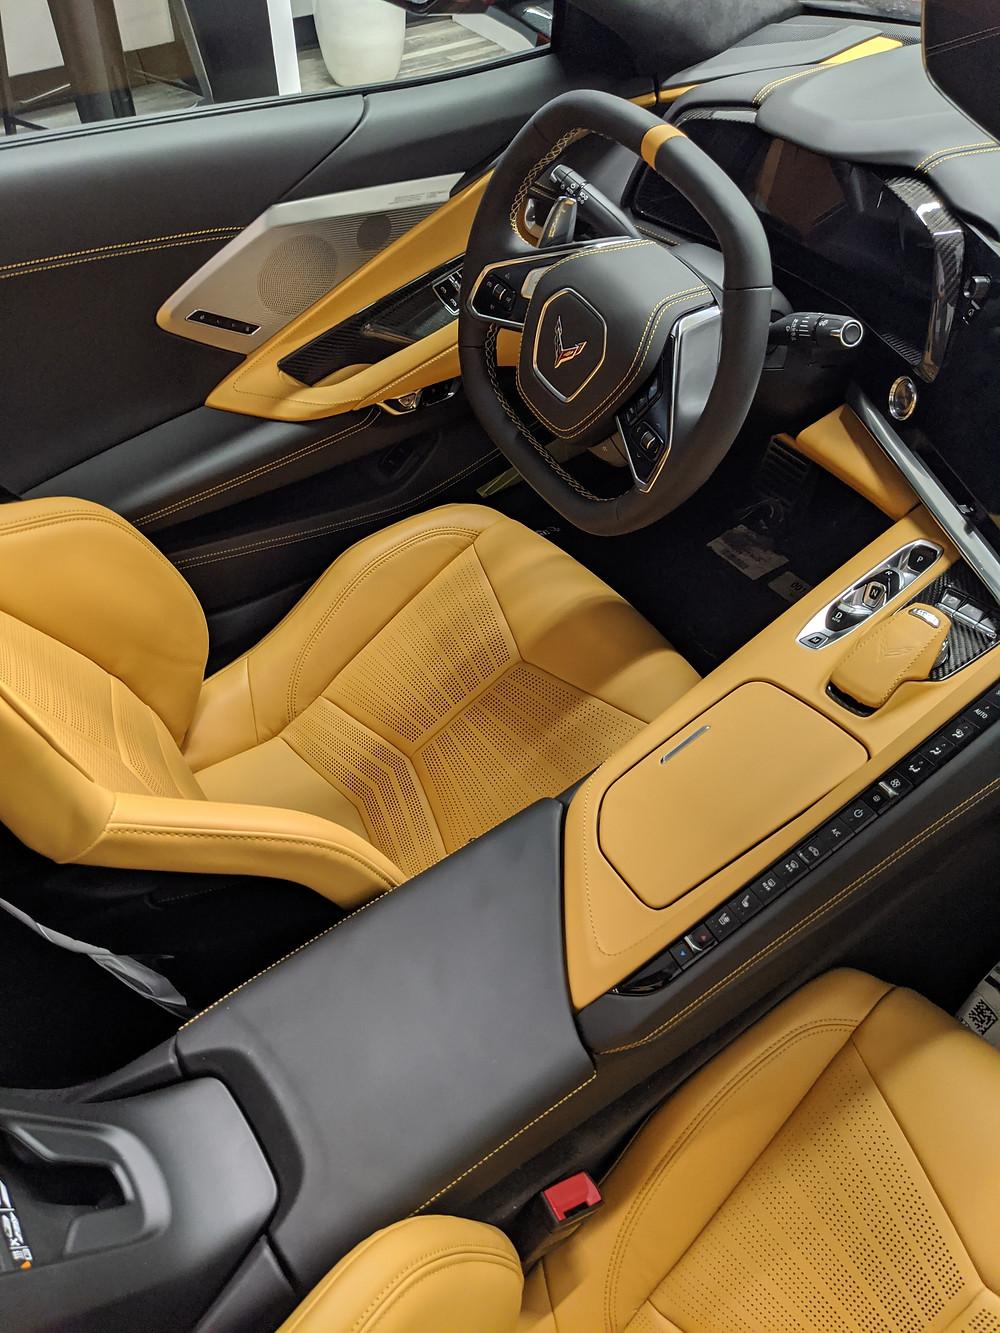 Protect your 2020 Corvette C8 interior with ceramic pro